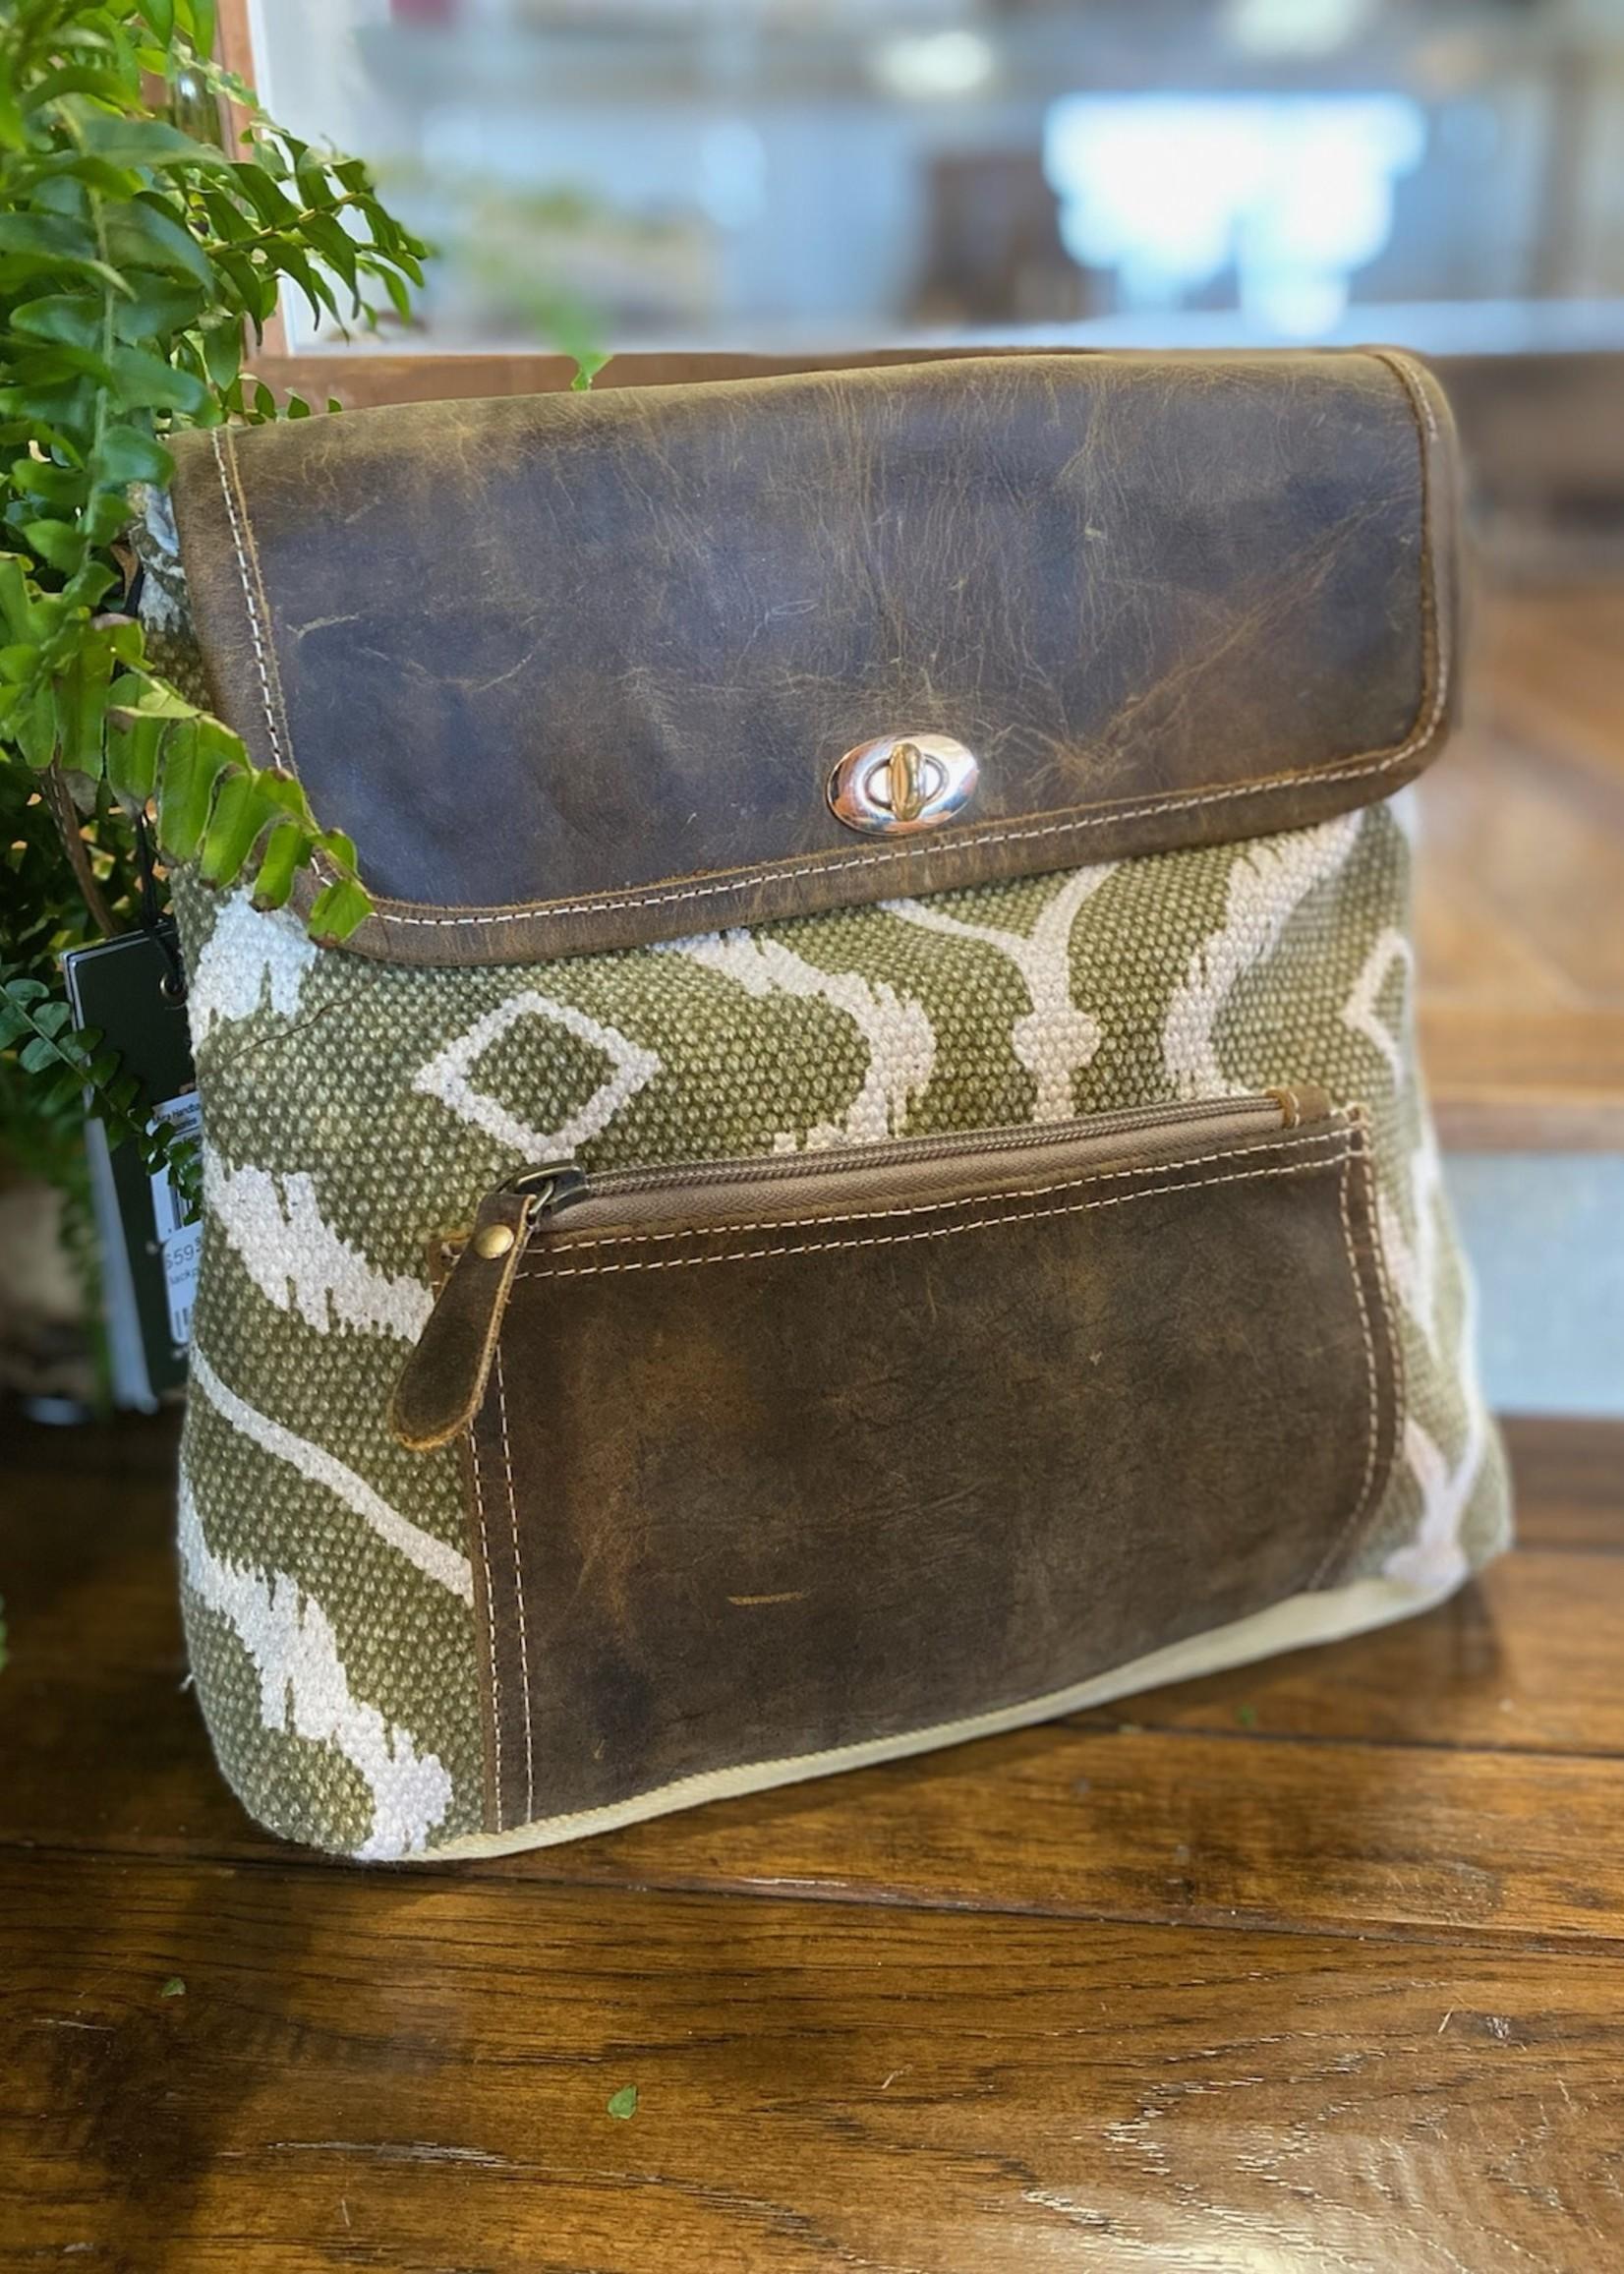 The Brown Fantasy Backpack Bag